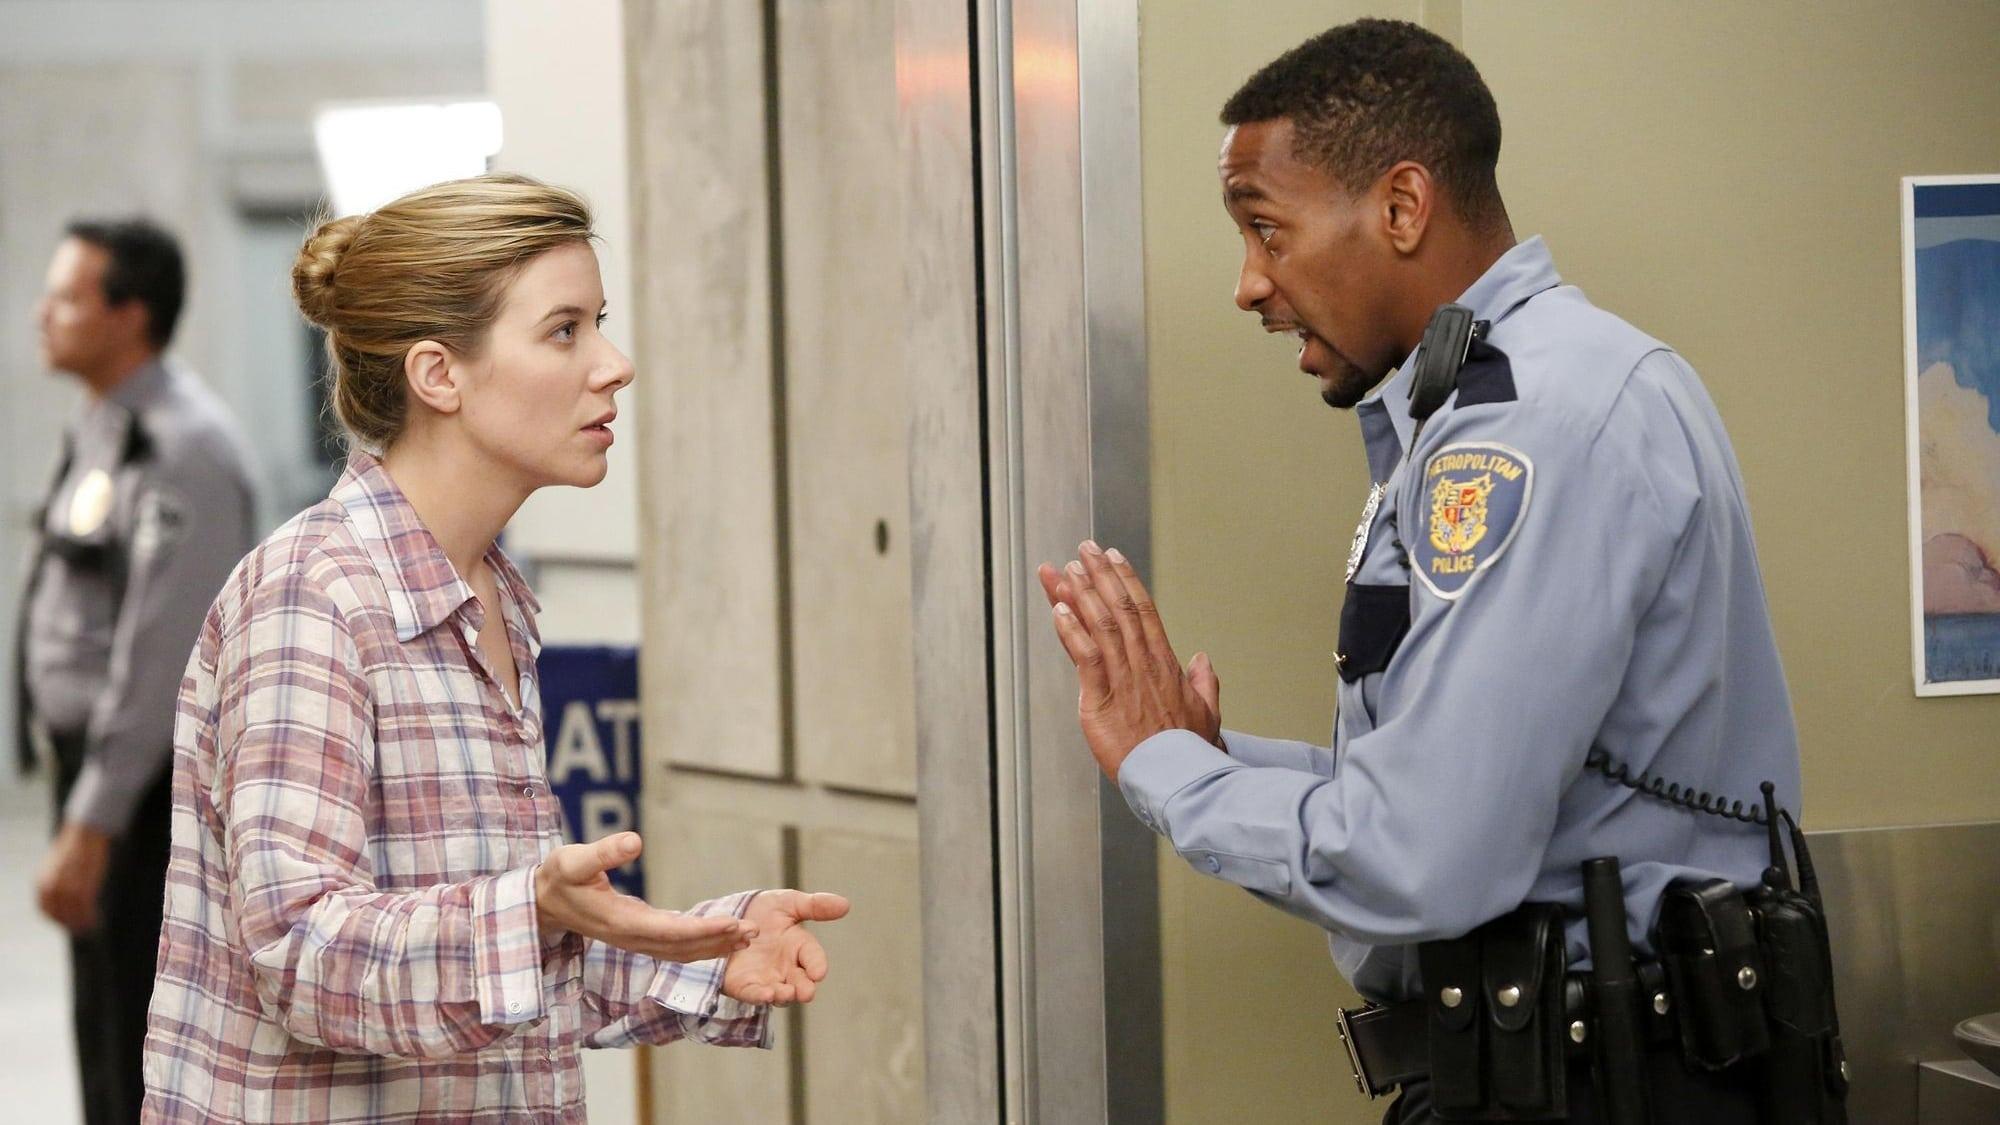 Grey\'s Anatomy: Season 10 Episode 24 S10E24 Openload Watch Free ...